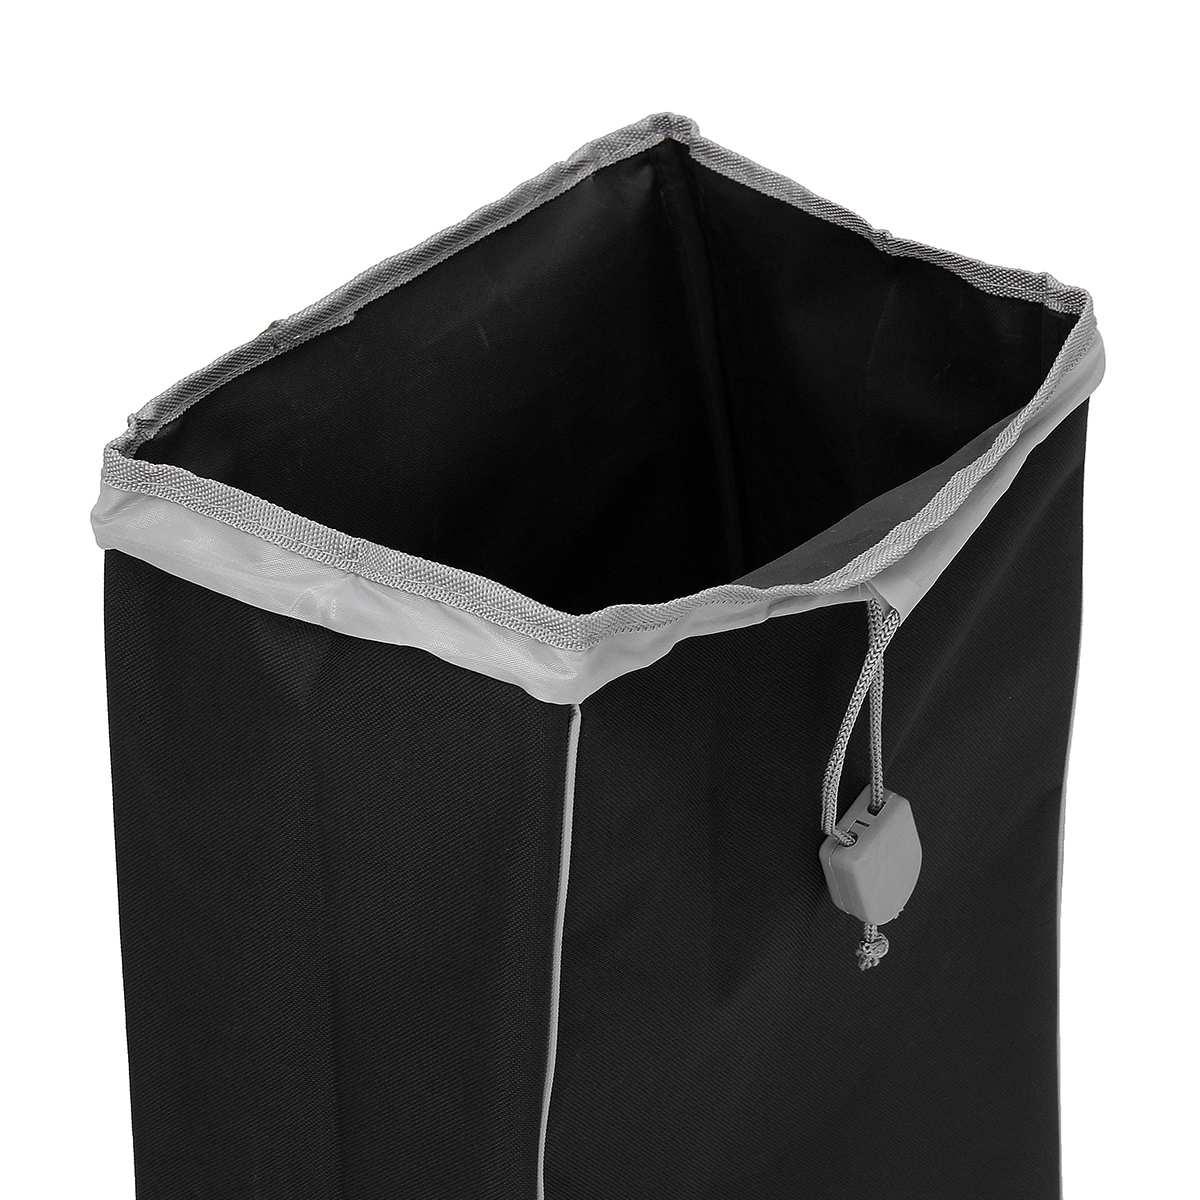 45L Складная хозяйственная сумка-тележка на колесиках, сумка для тележки на колесиках, корзина для багажа, колеса, ткань Оксфорд, Floding